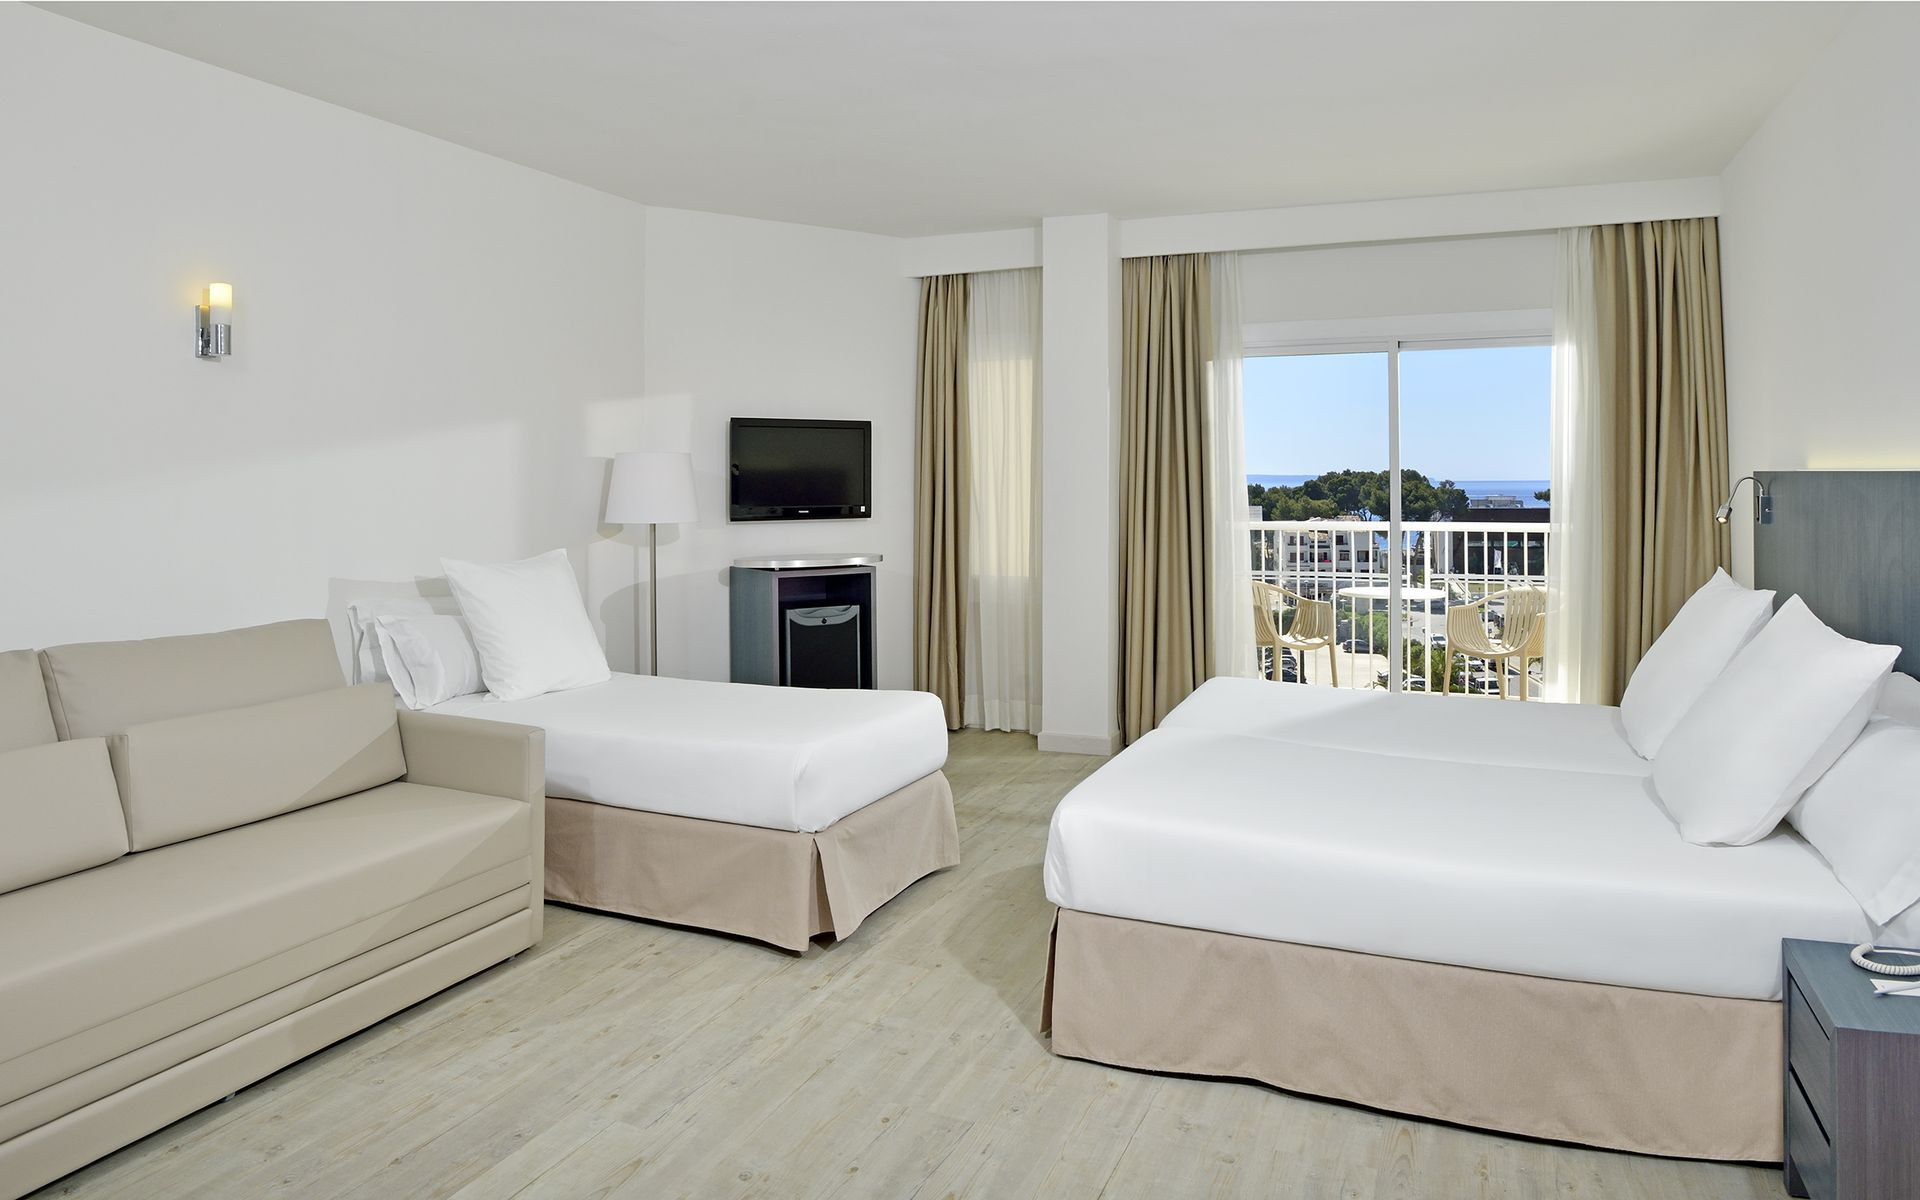 Hotel sol guadalupe en magaluf mallorca desde 33 for Habitacion familiar estandar